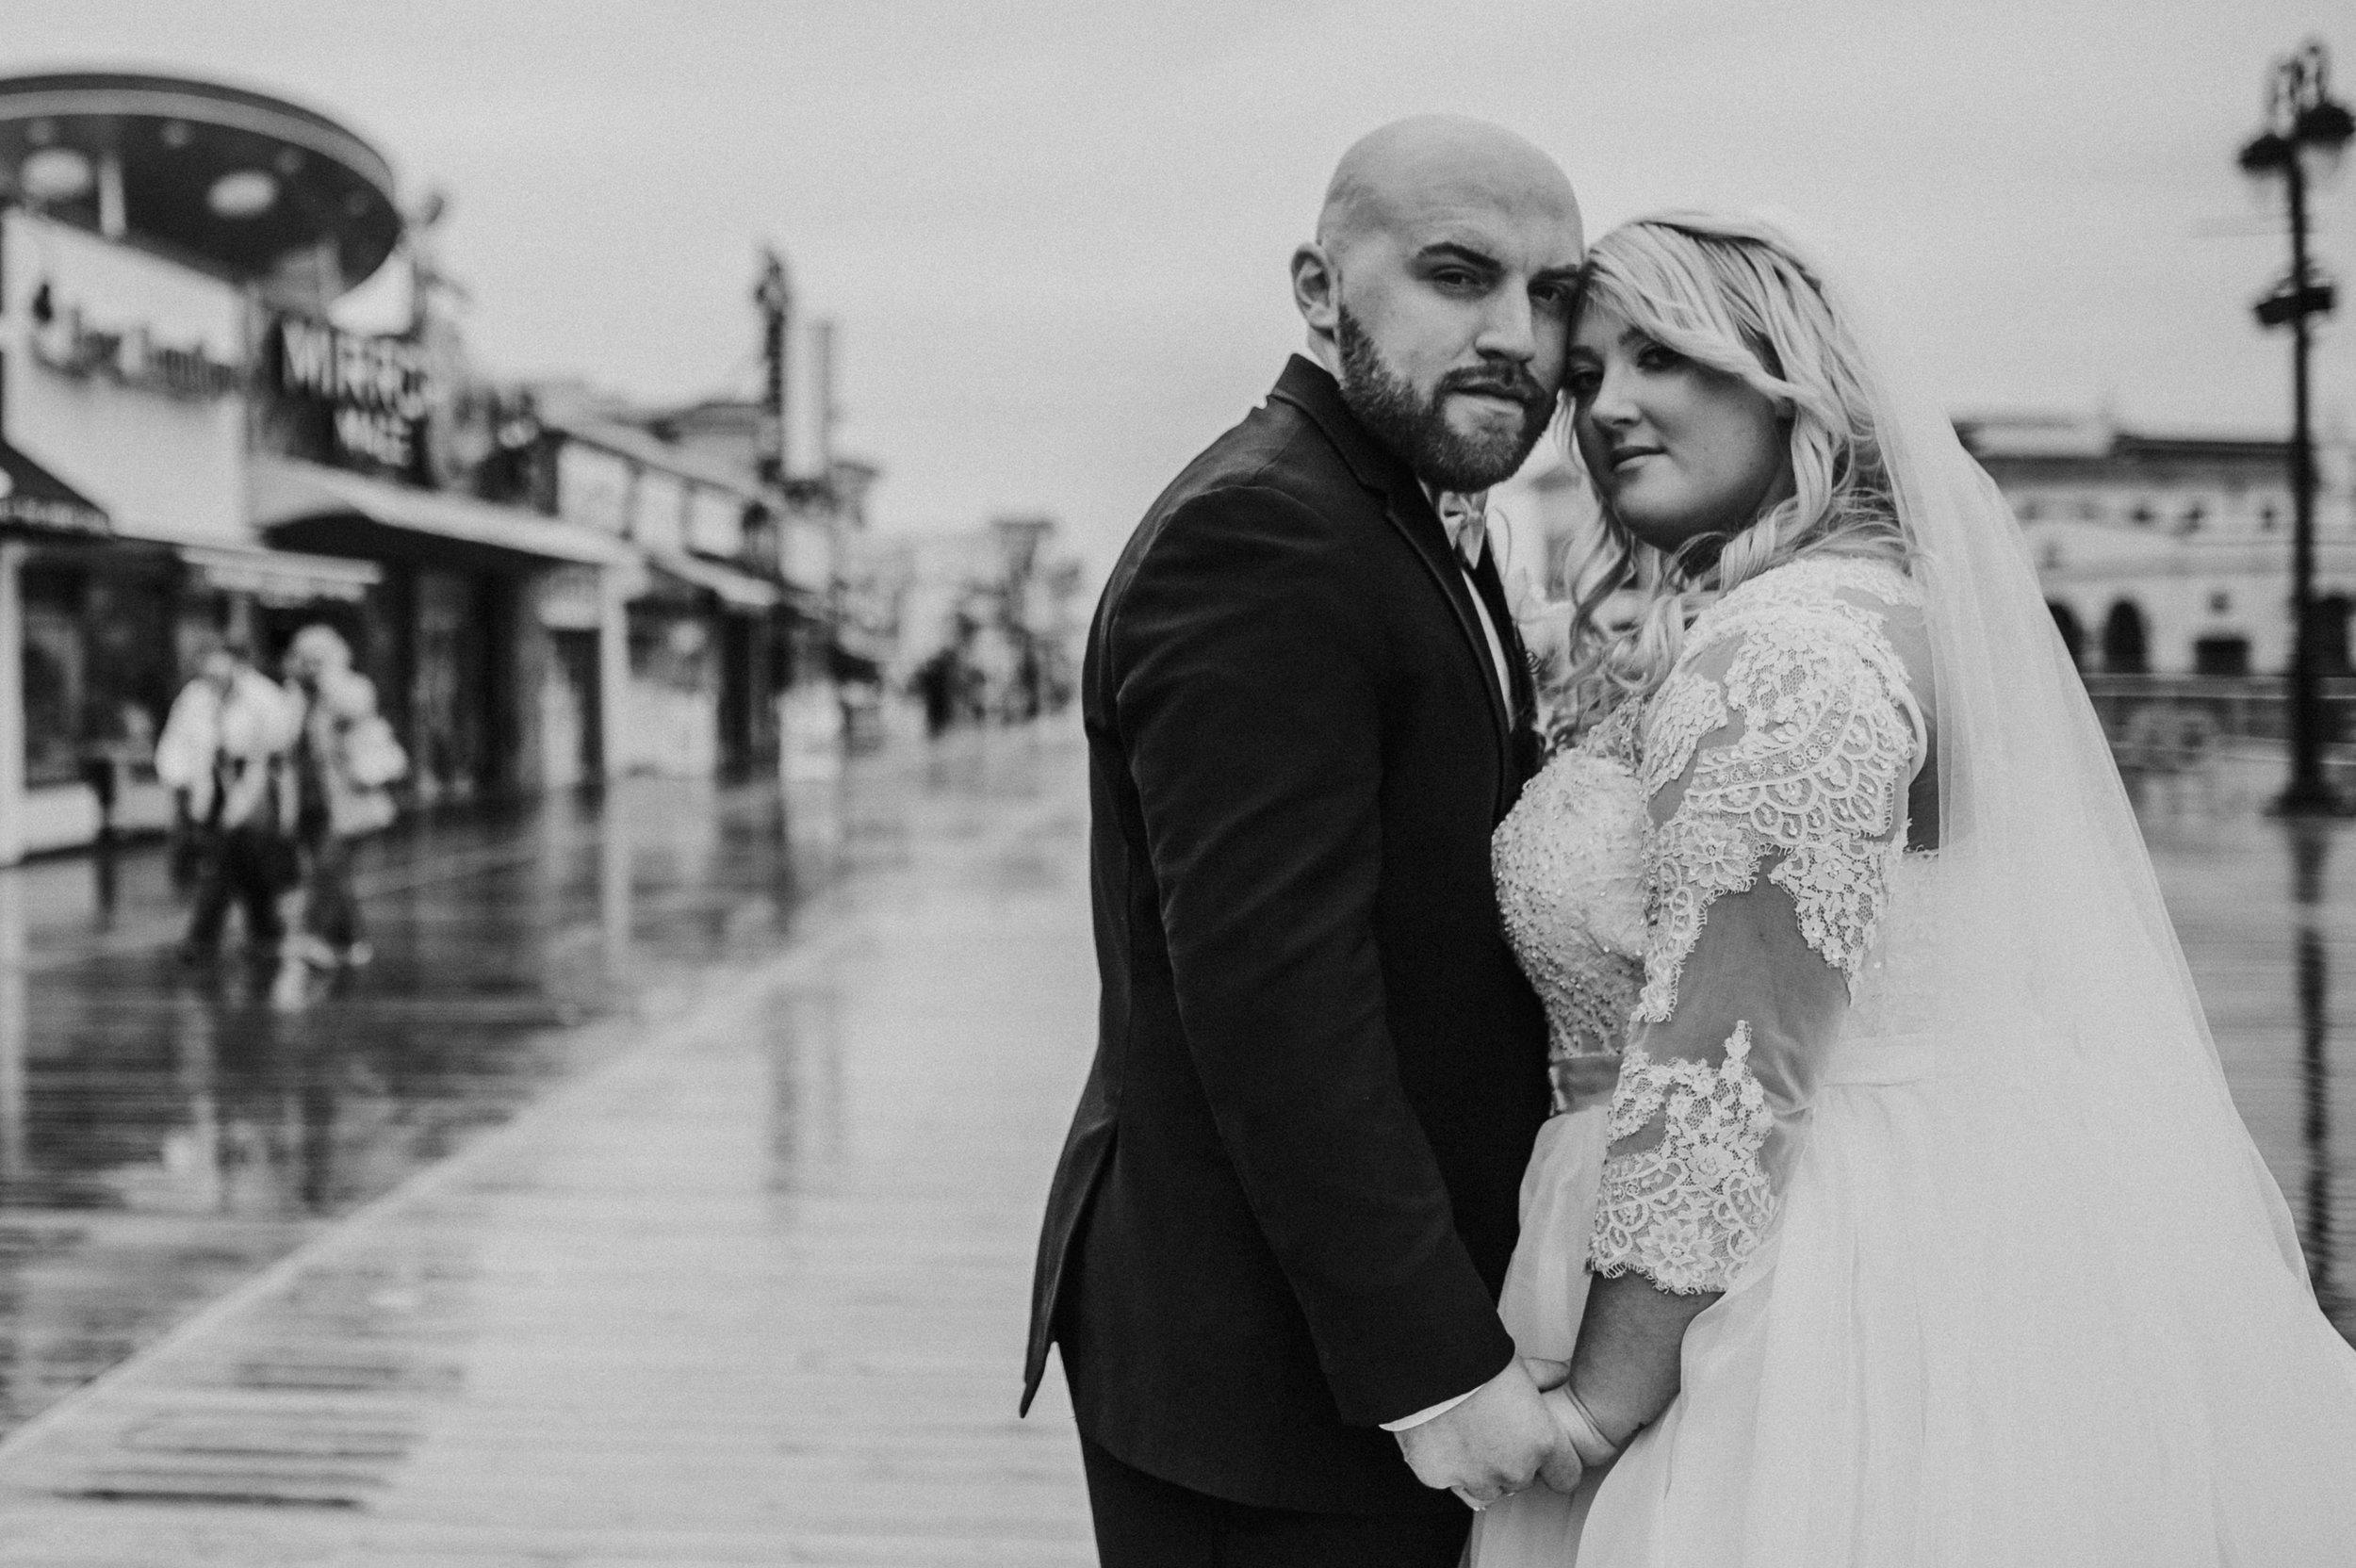 Morgan-and-Cory-Ocean-City-Wedding-148.jpg